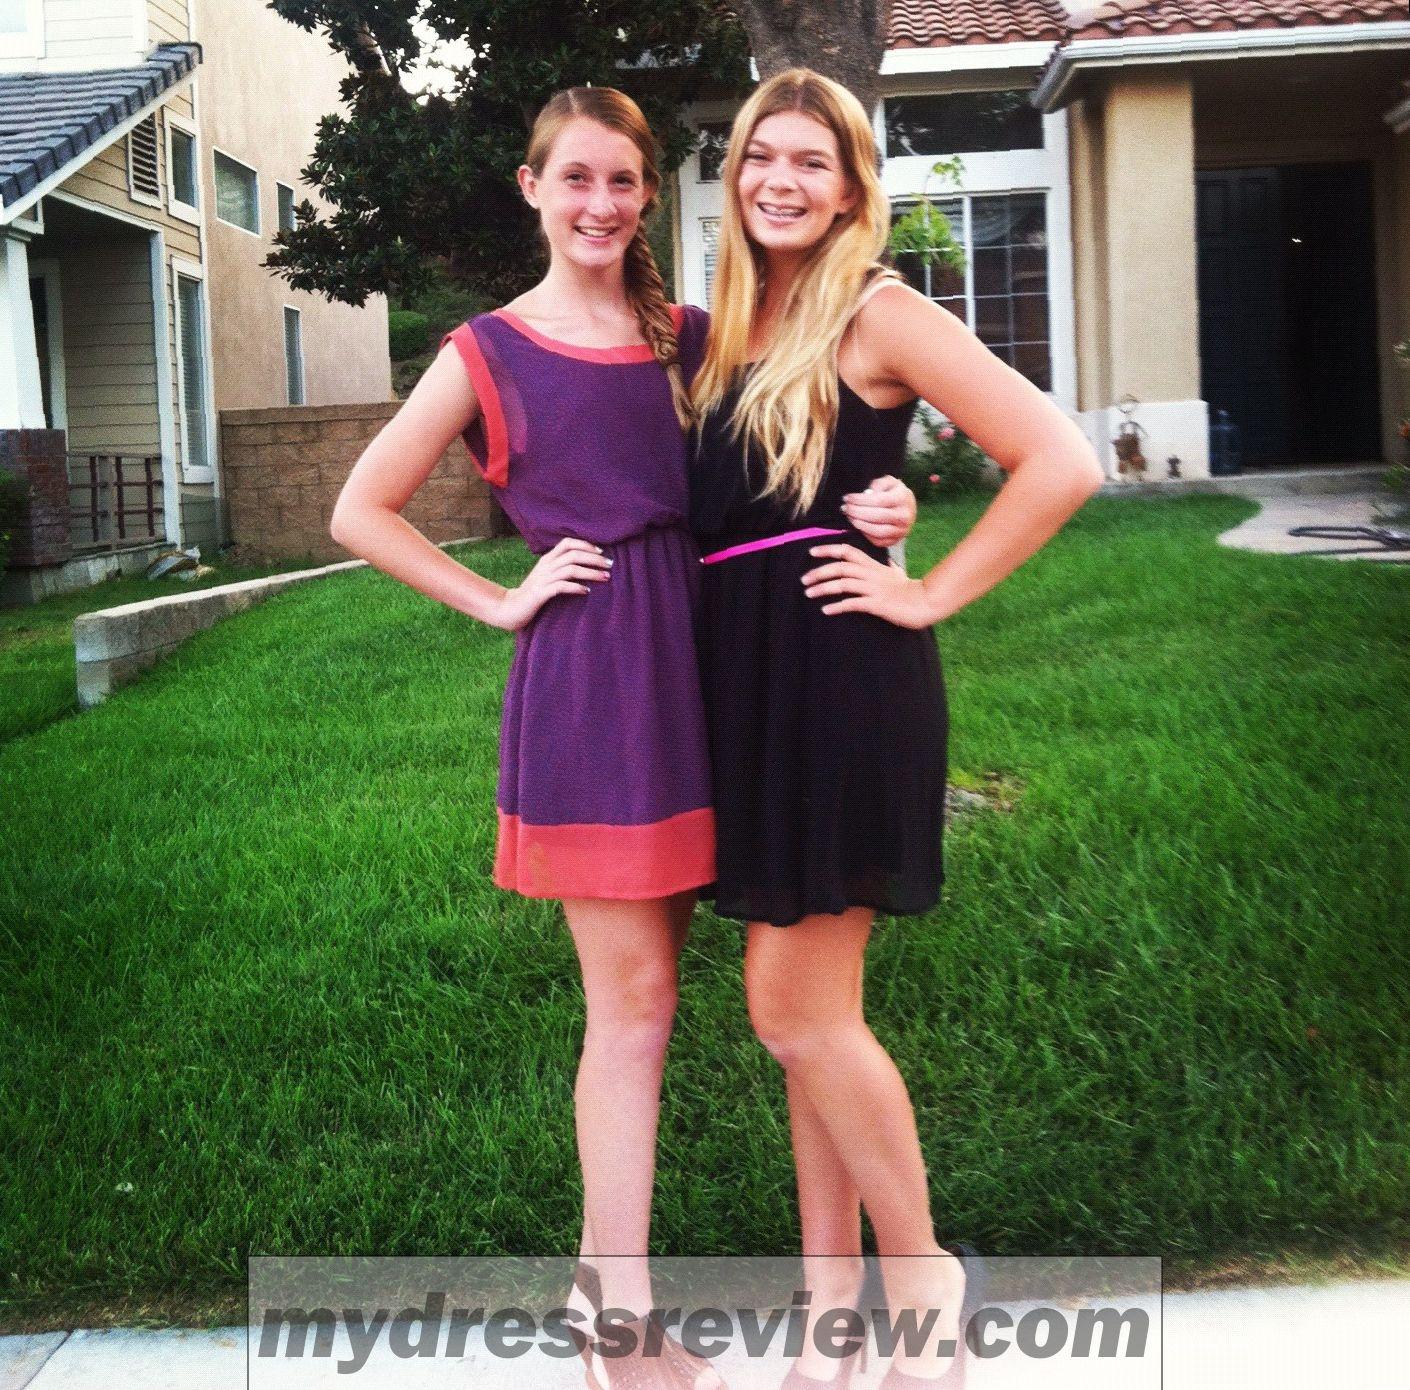 Teen boys in prom dresses